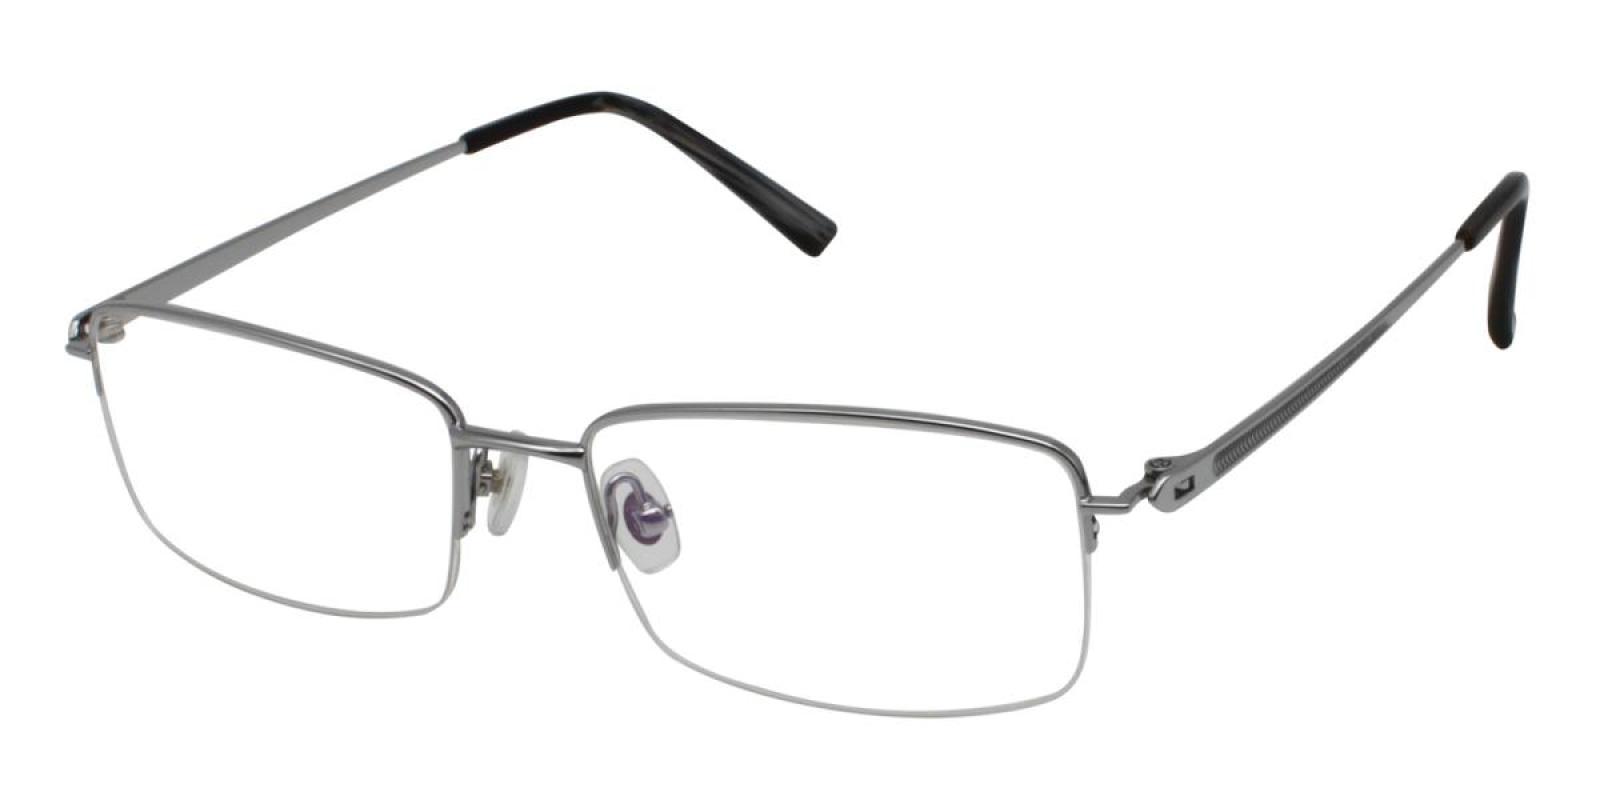 Oliv-Silver-Rectangle-Titanium-Eyeglasses-detail